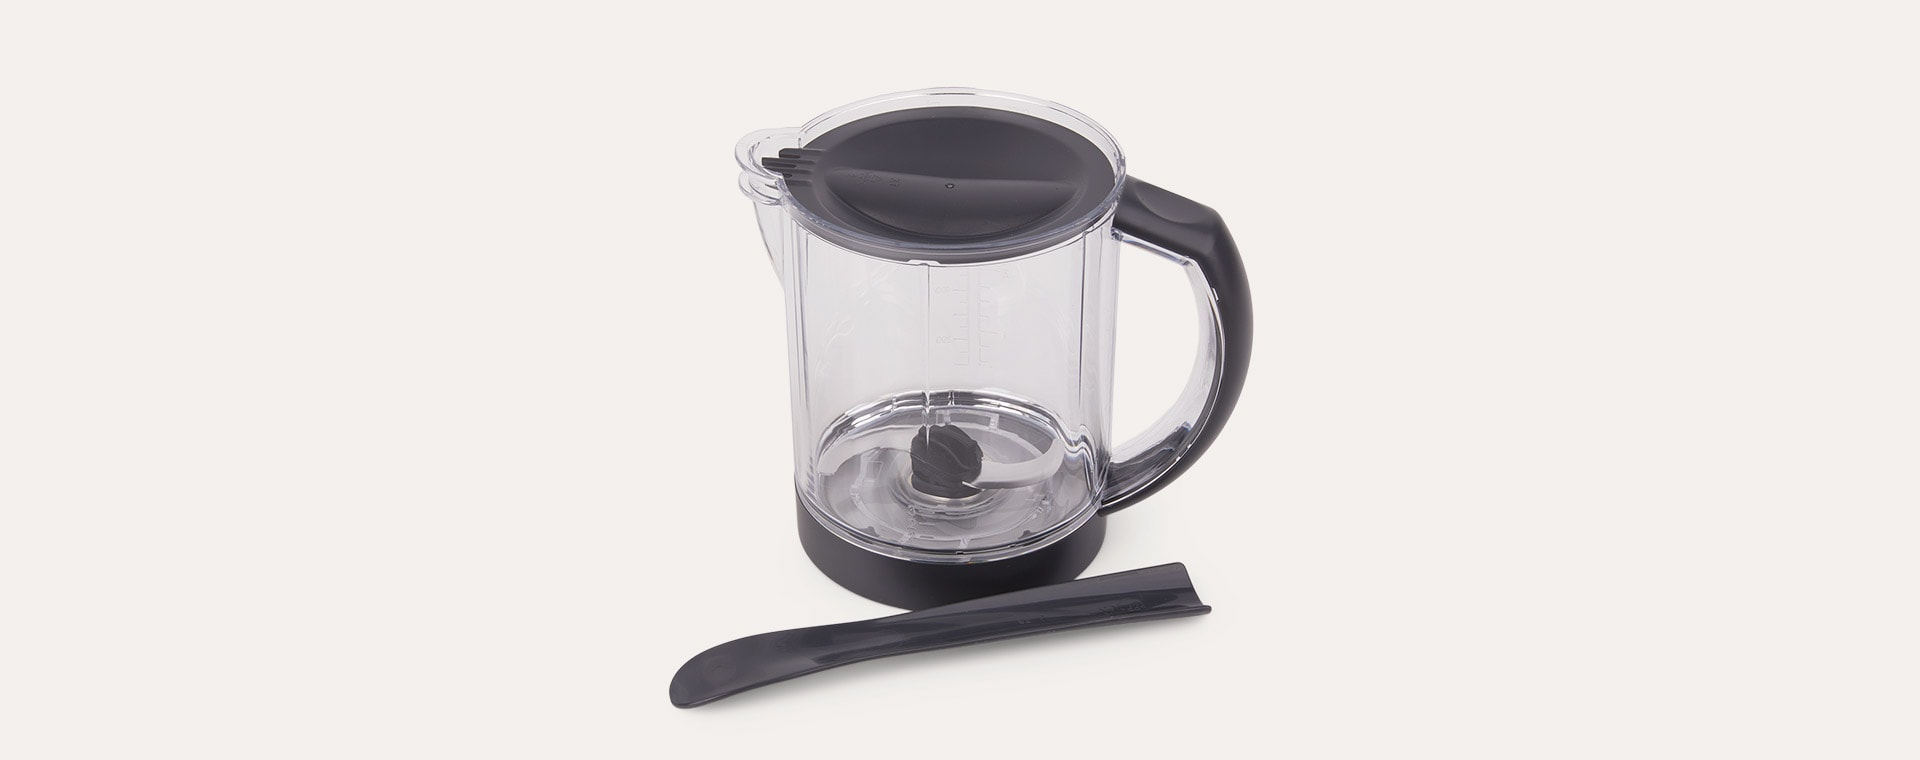 Dark Grey Beaba Babycook Solo Baby Food Steamer Blender